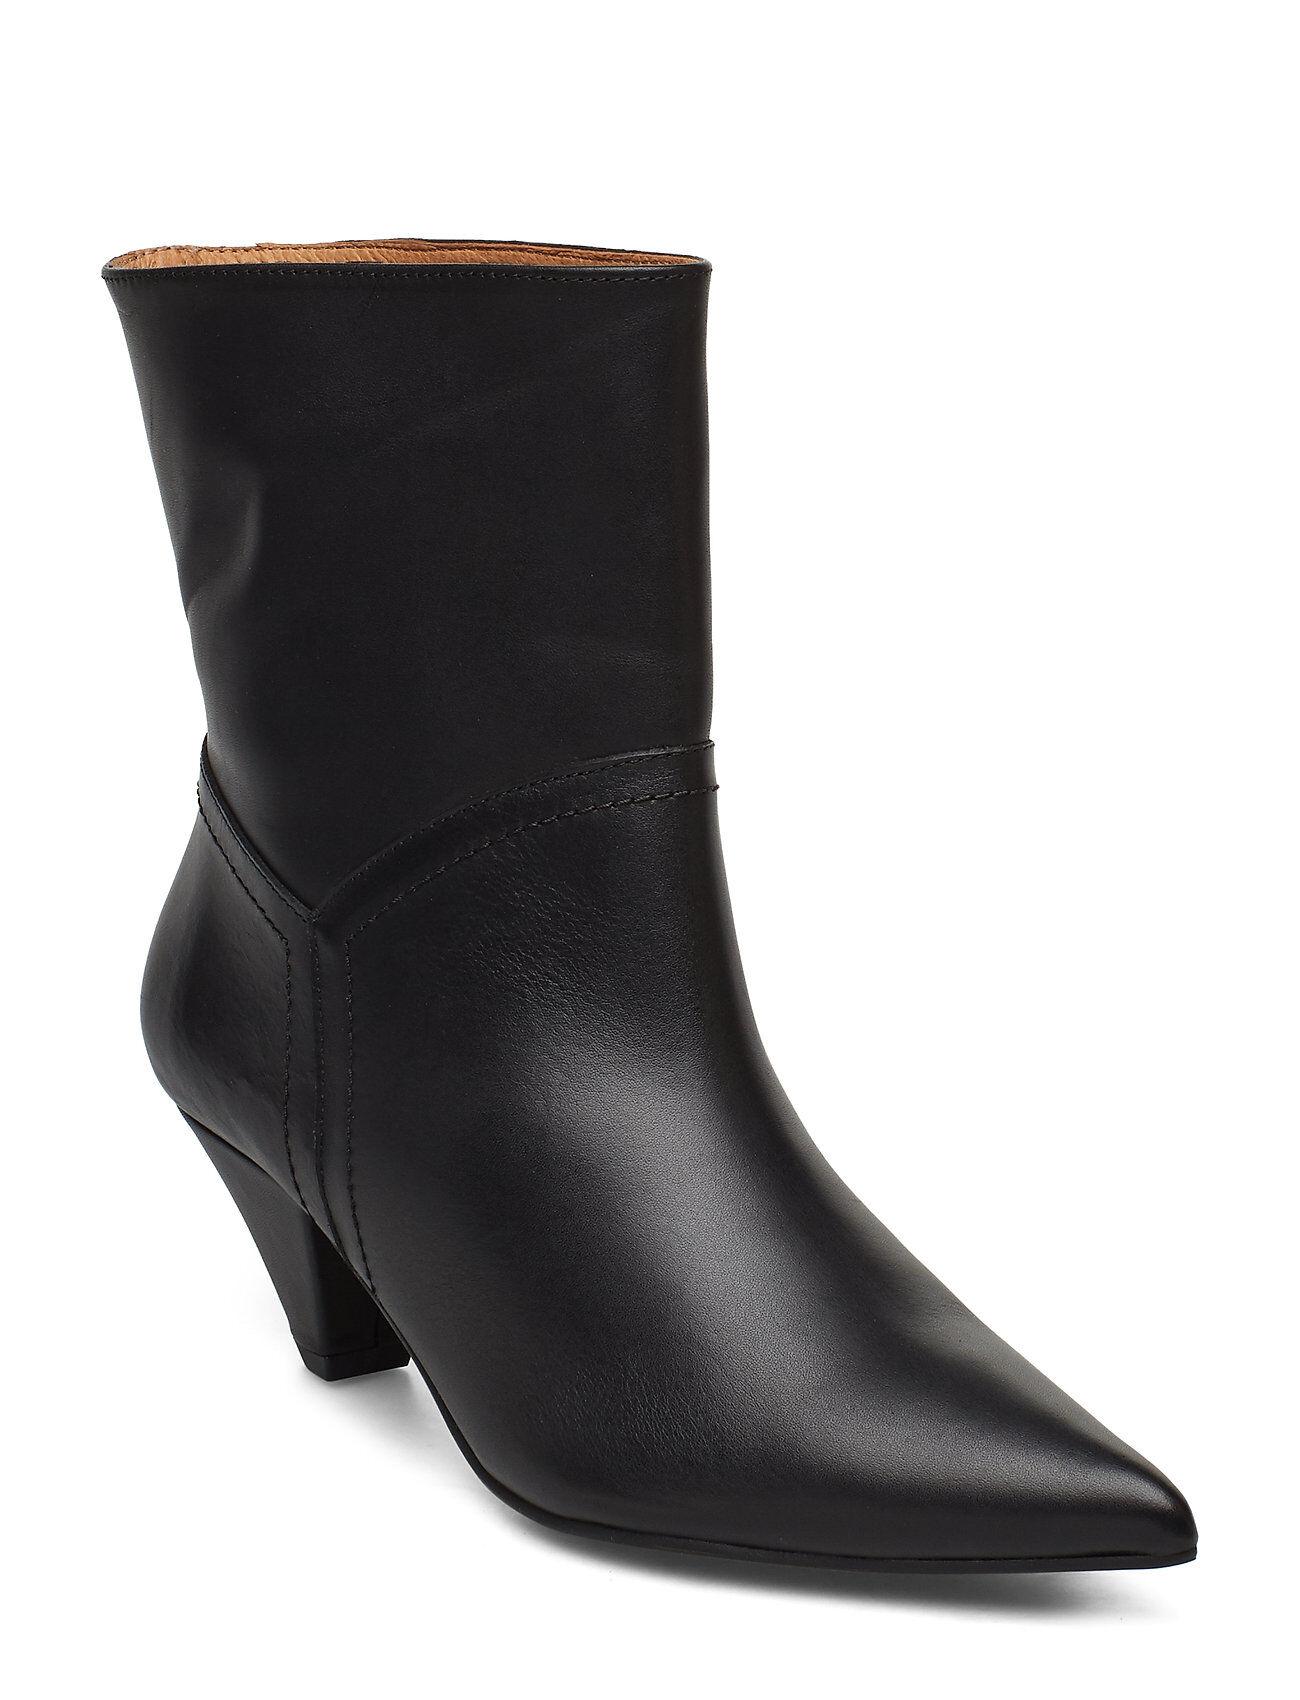 Henry Kole Selena Leather Black Shoes Boots Ankle Boots Ankle Boots With Heel Musta Henry Kole